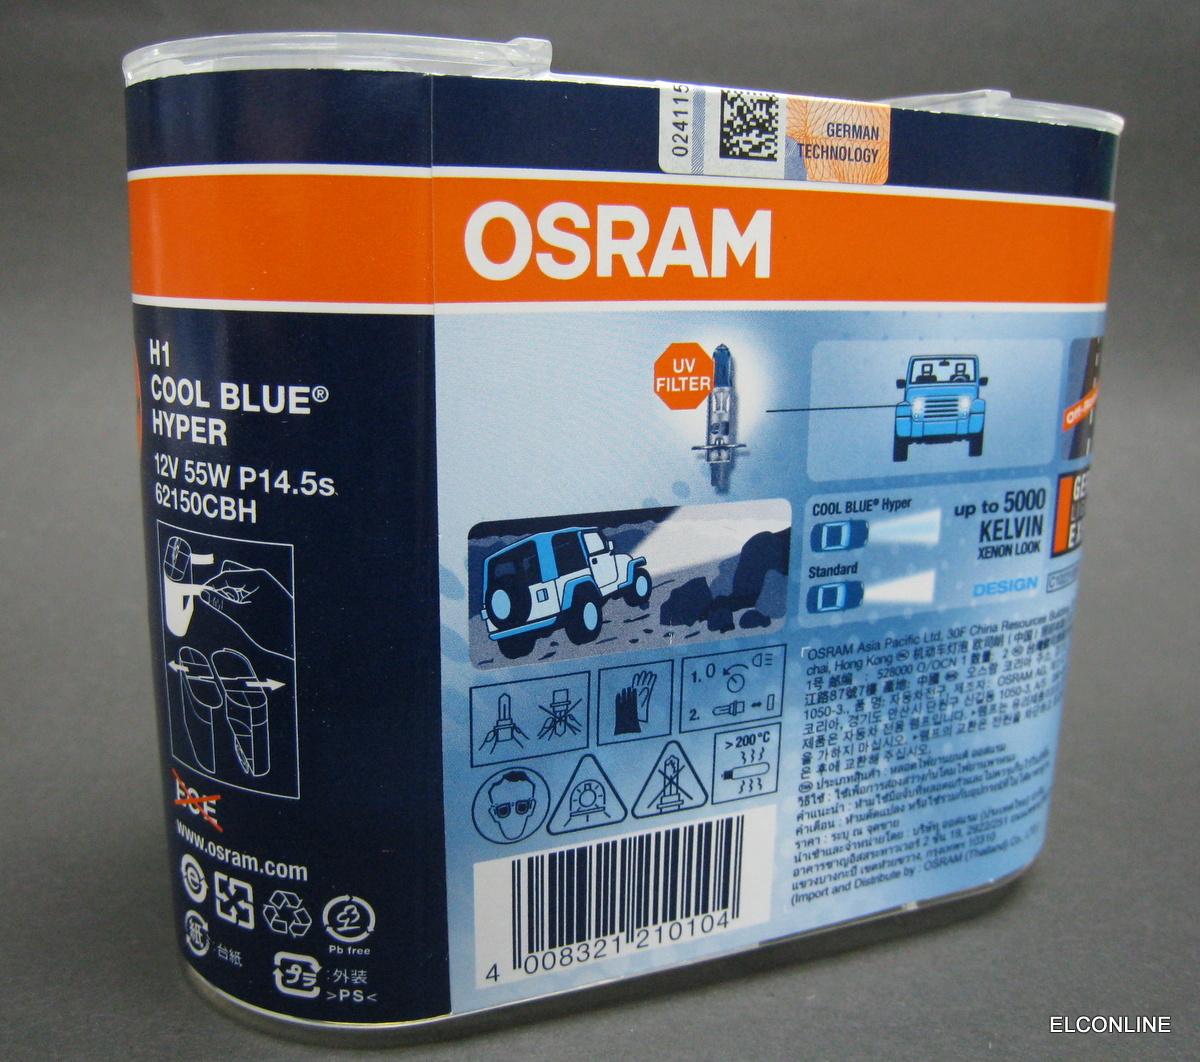 h1 osram gtcs 12v 55w cool blue hyper white 5000k kelvin. Black Bedroom Furniture Sets. Home Design Ideas